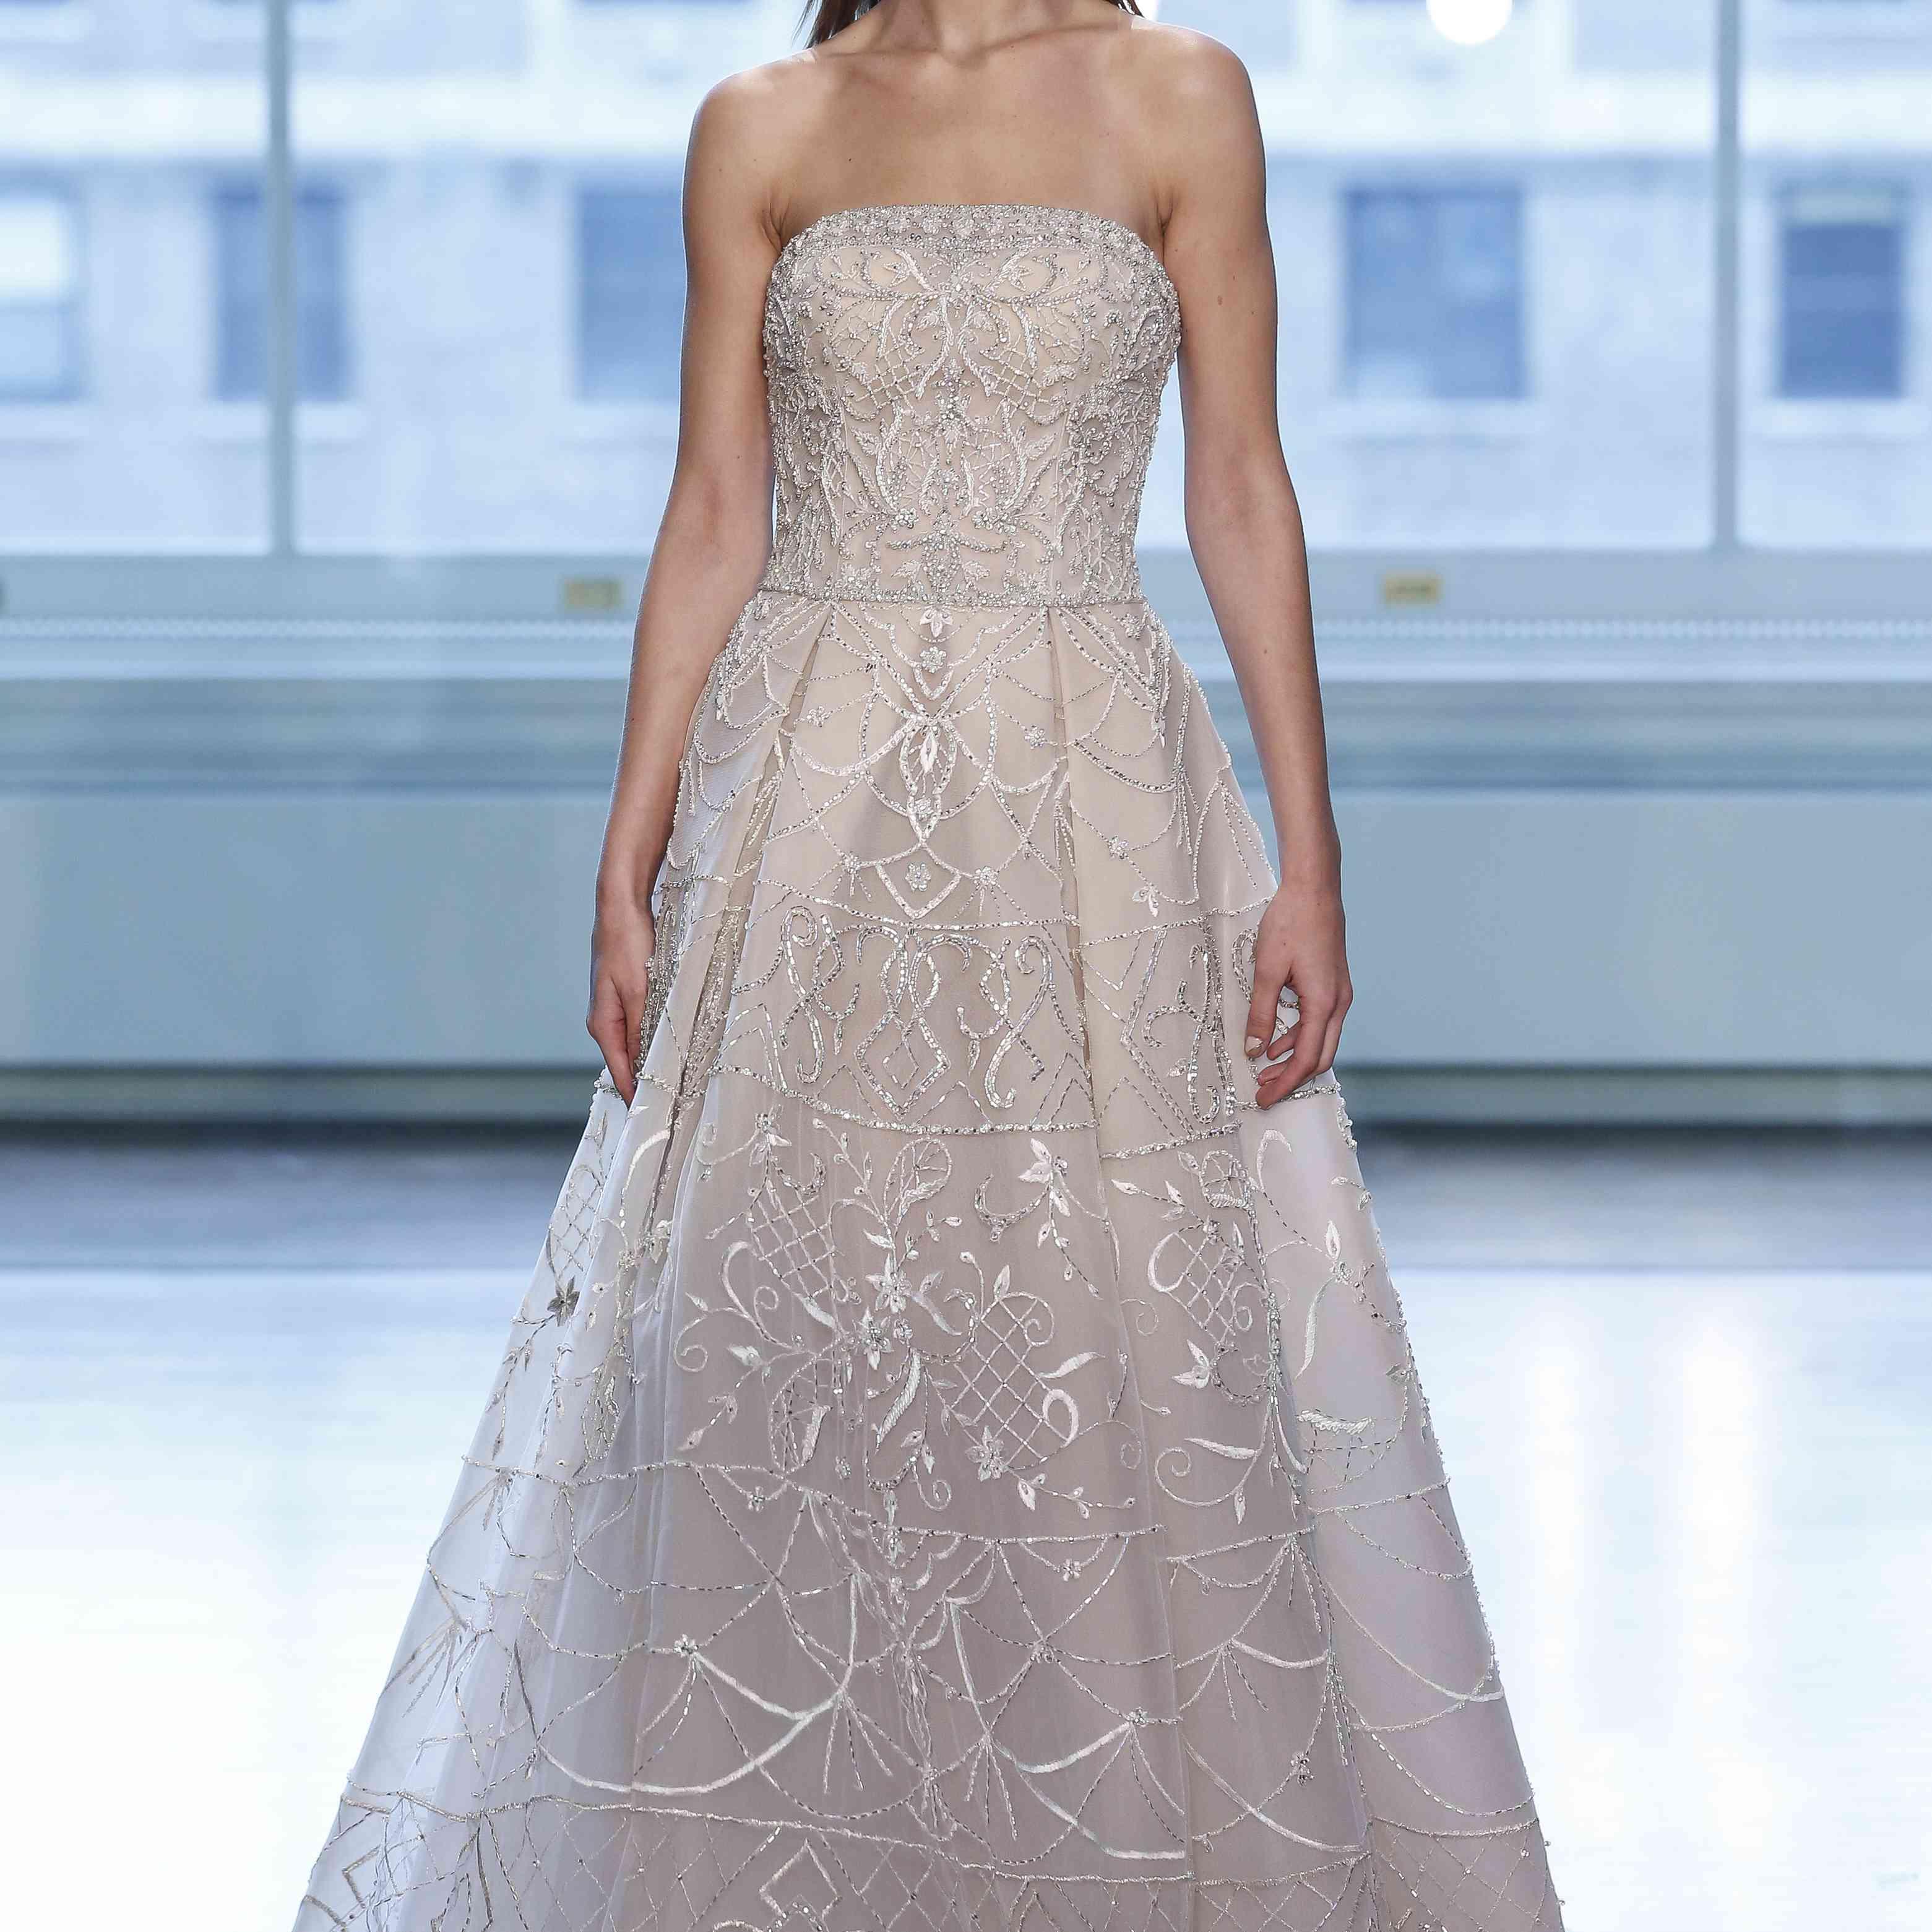 Gallery New Mira Zwillinger Wedding Dresses Spring 2019: Justin Alexander Bridal Spring 2019